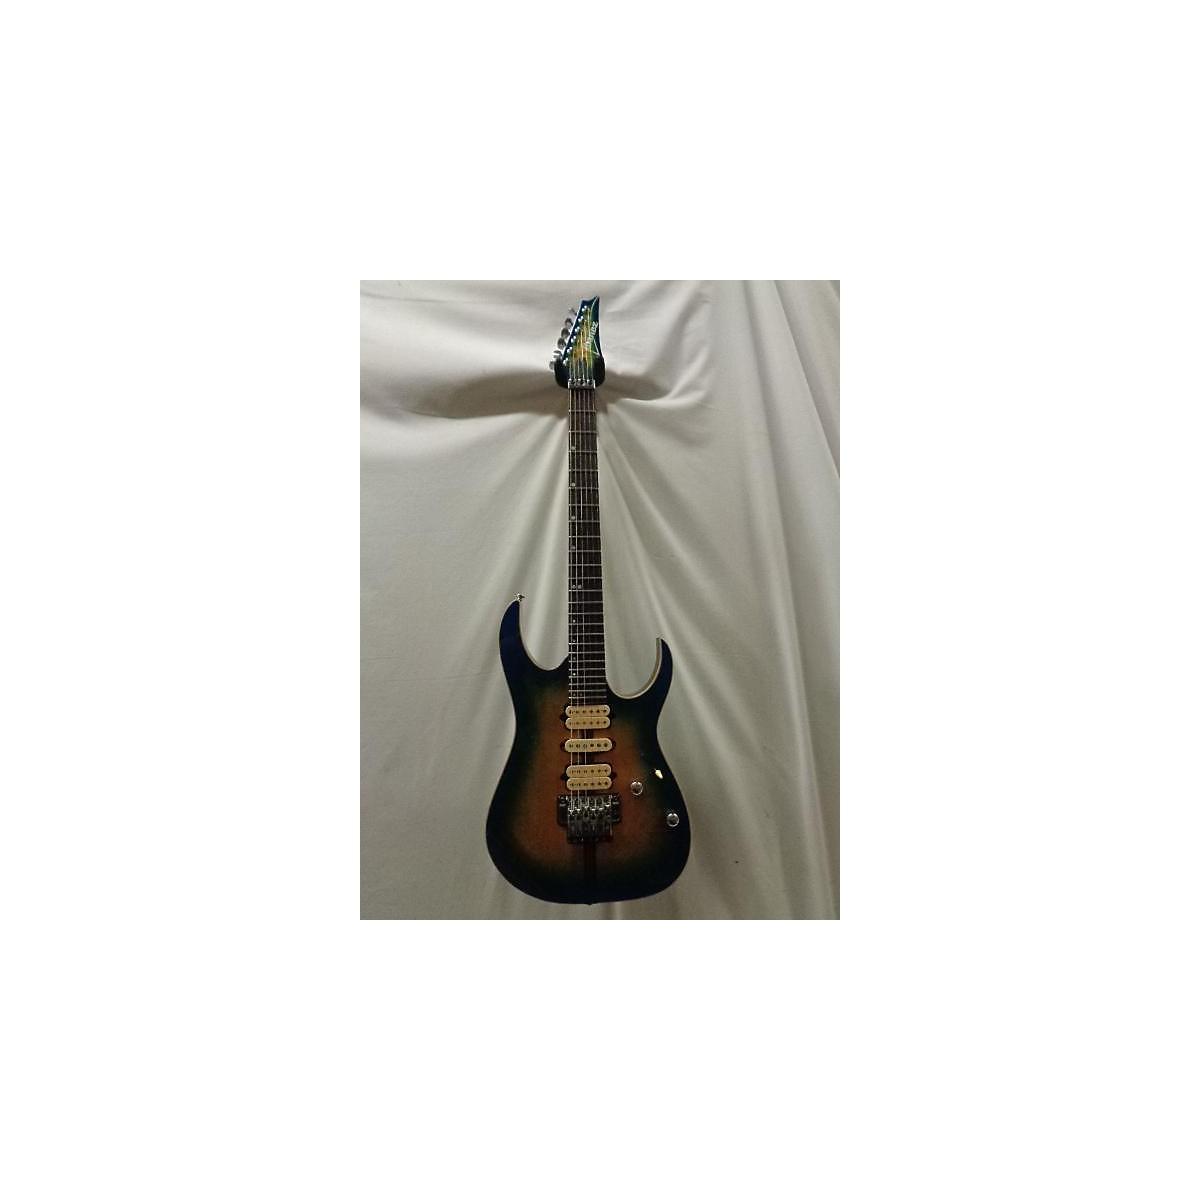 Ibanez RG6PFGMLTD Solid Body Electric Guitar